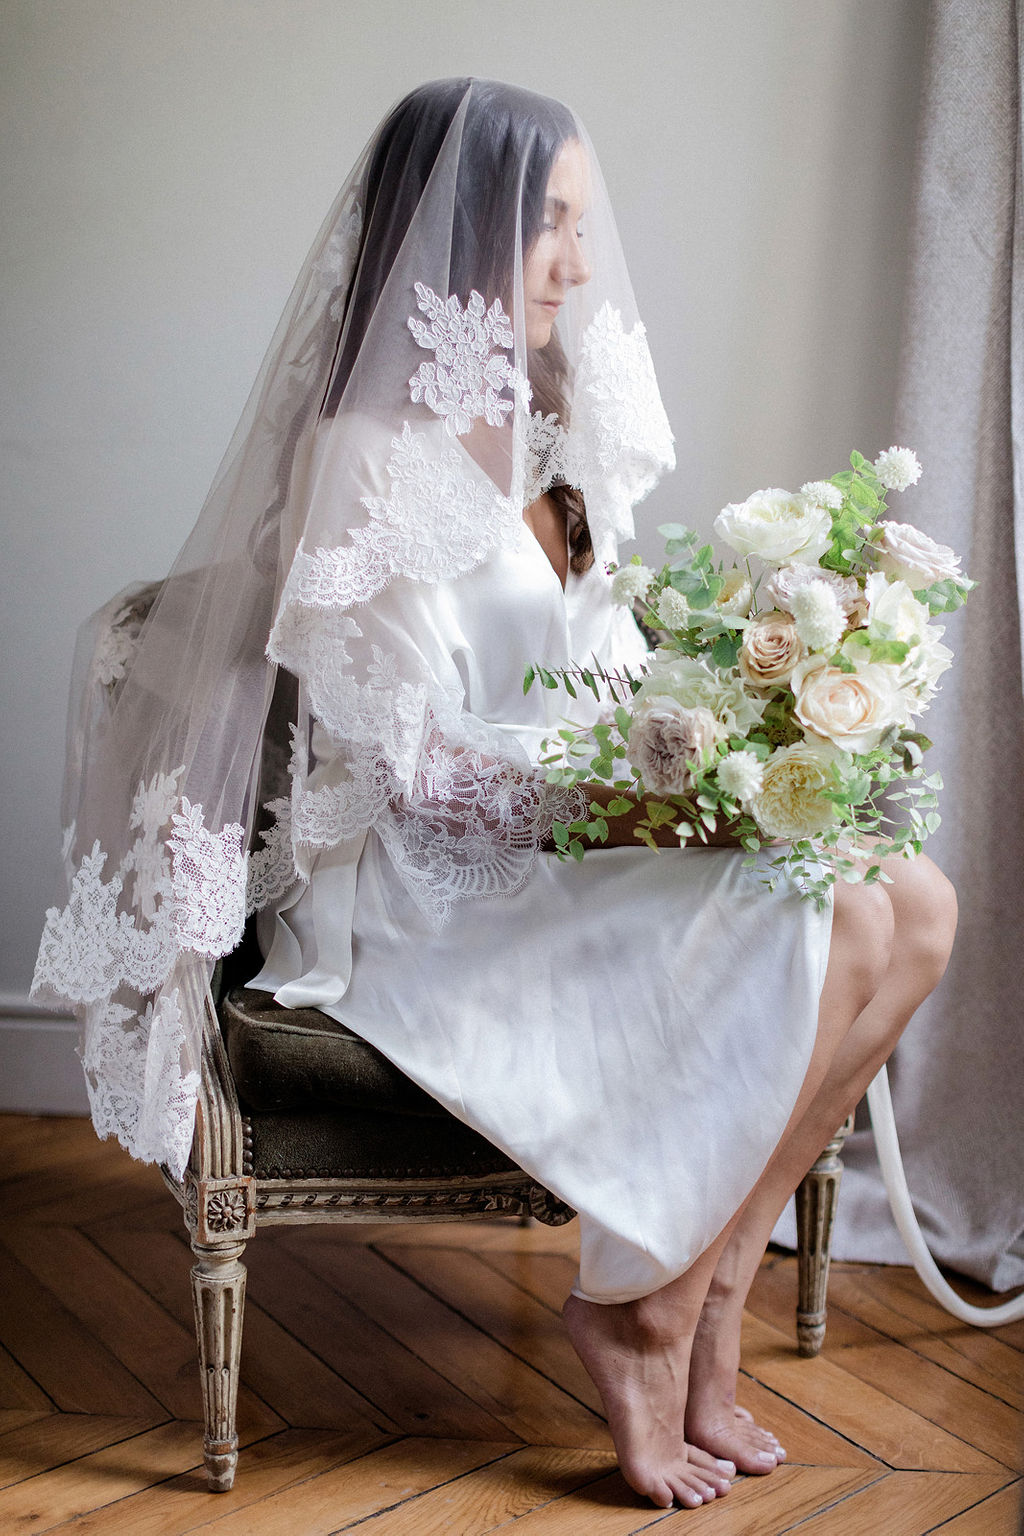 Bridal preparation, Paris 2019